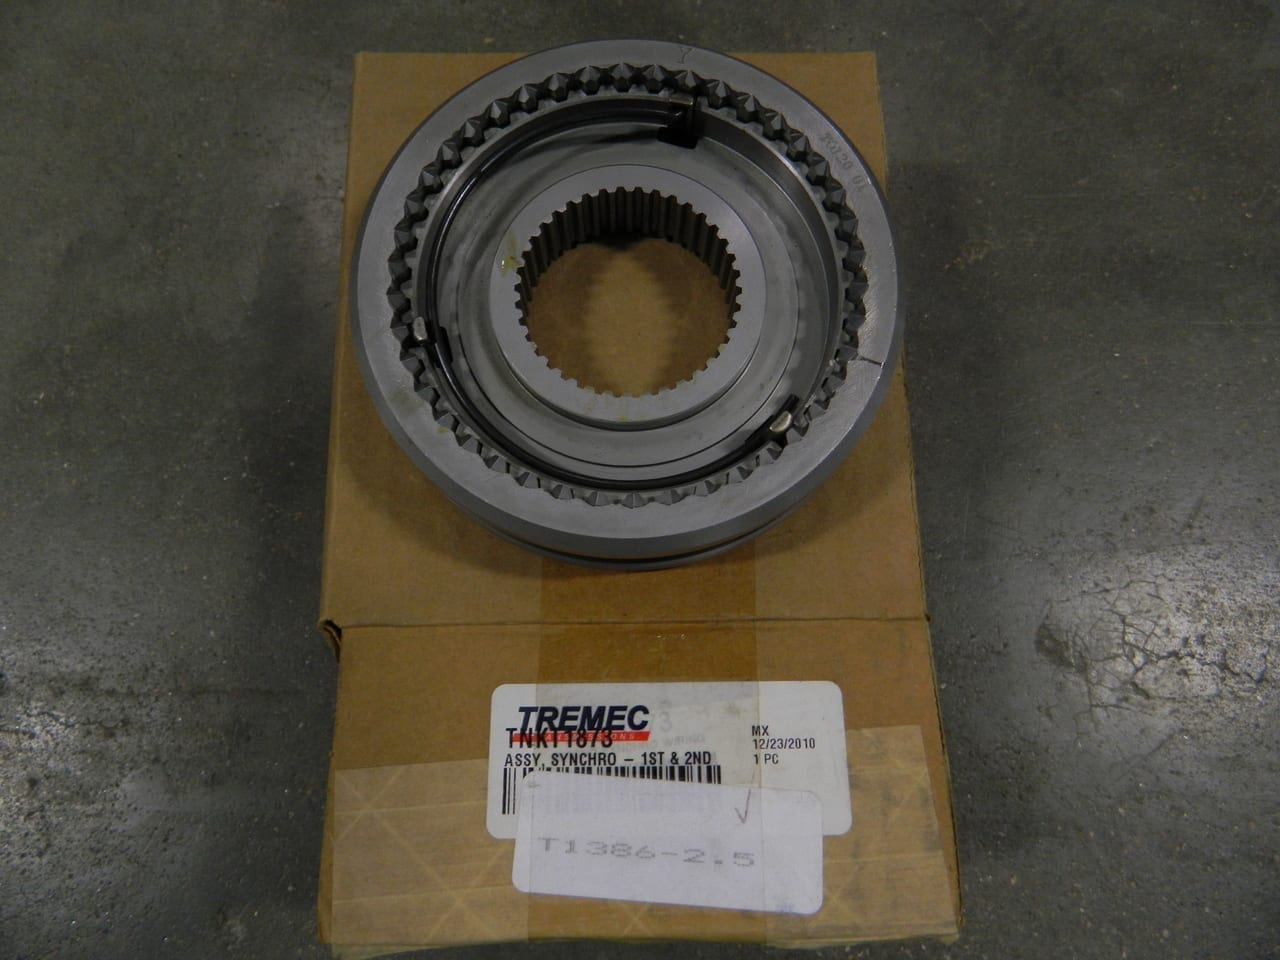 1-2 Synchronizer assembly Tremec T56 6 speed transmission Camaro/Firebird